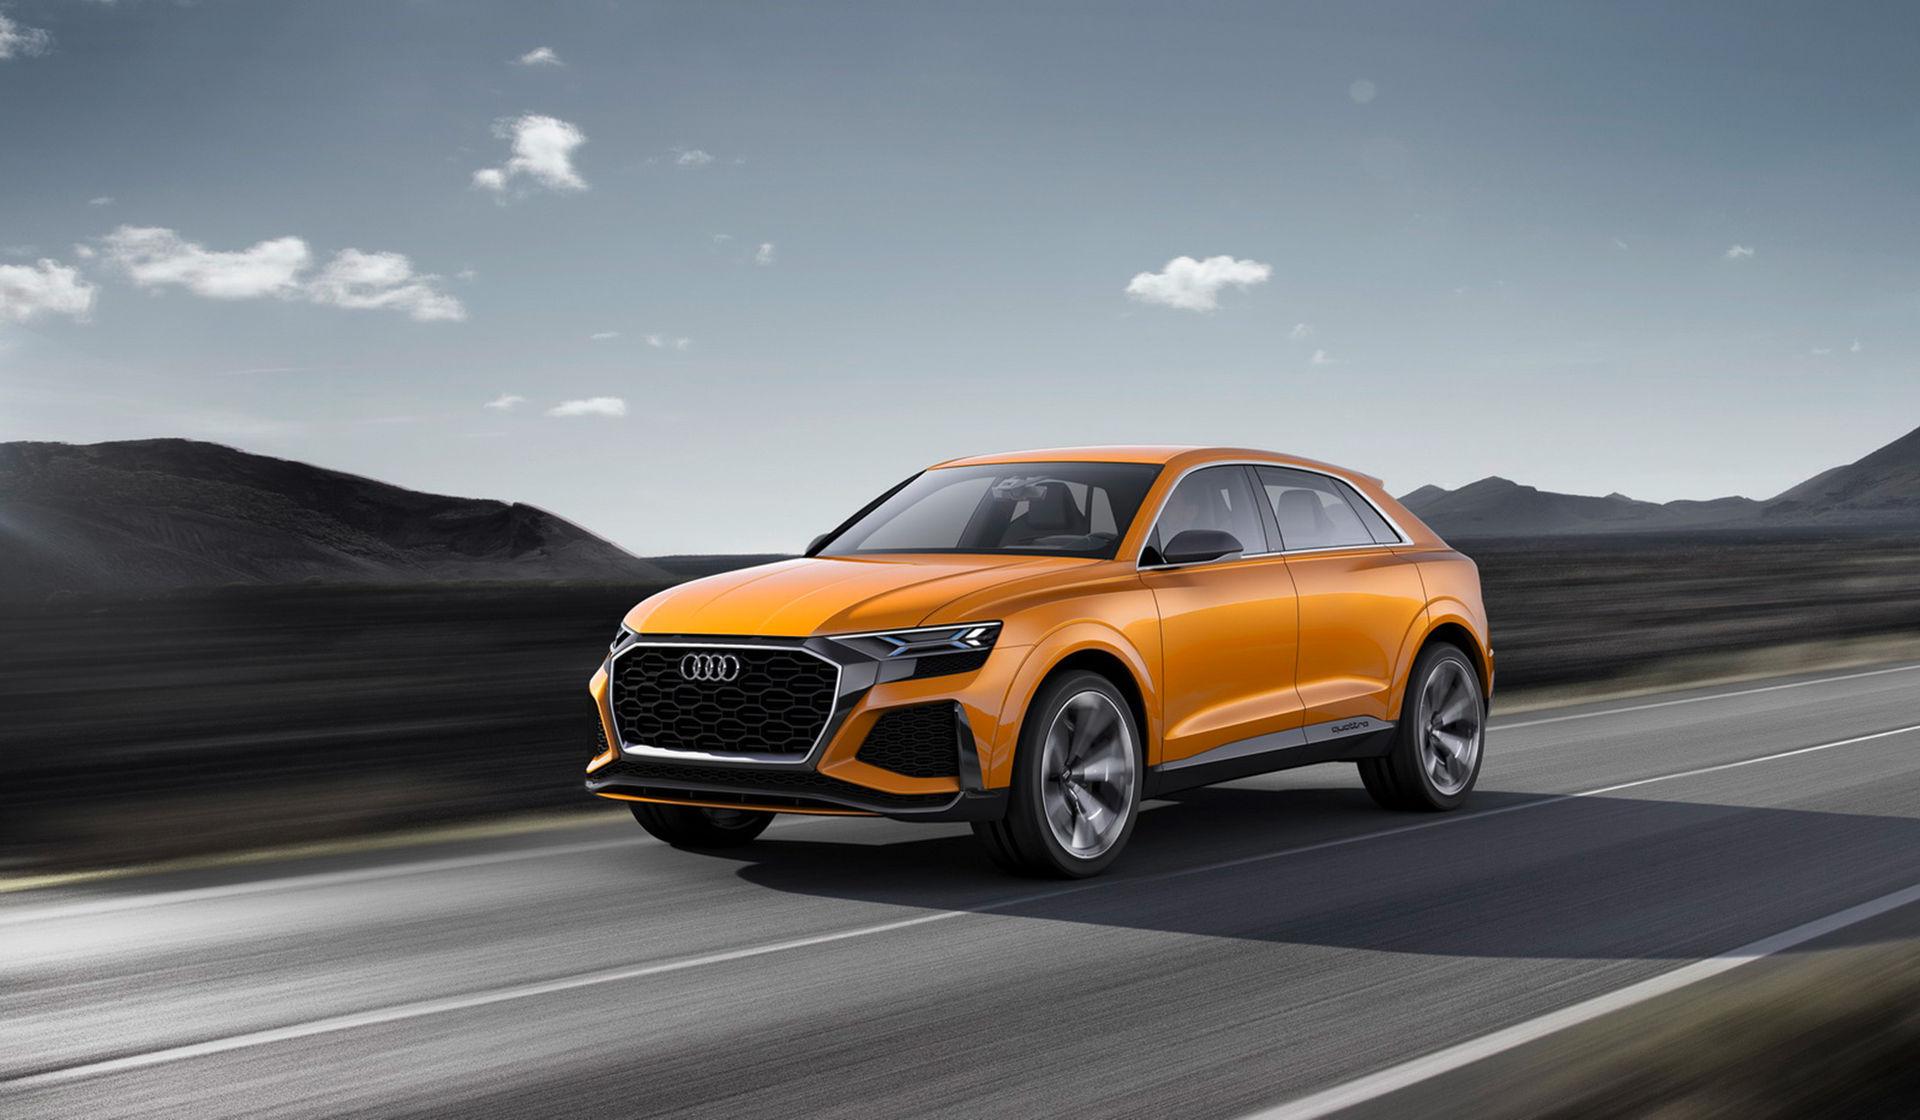 Audi visar sportigare koncept av Q8